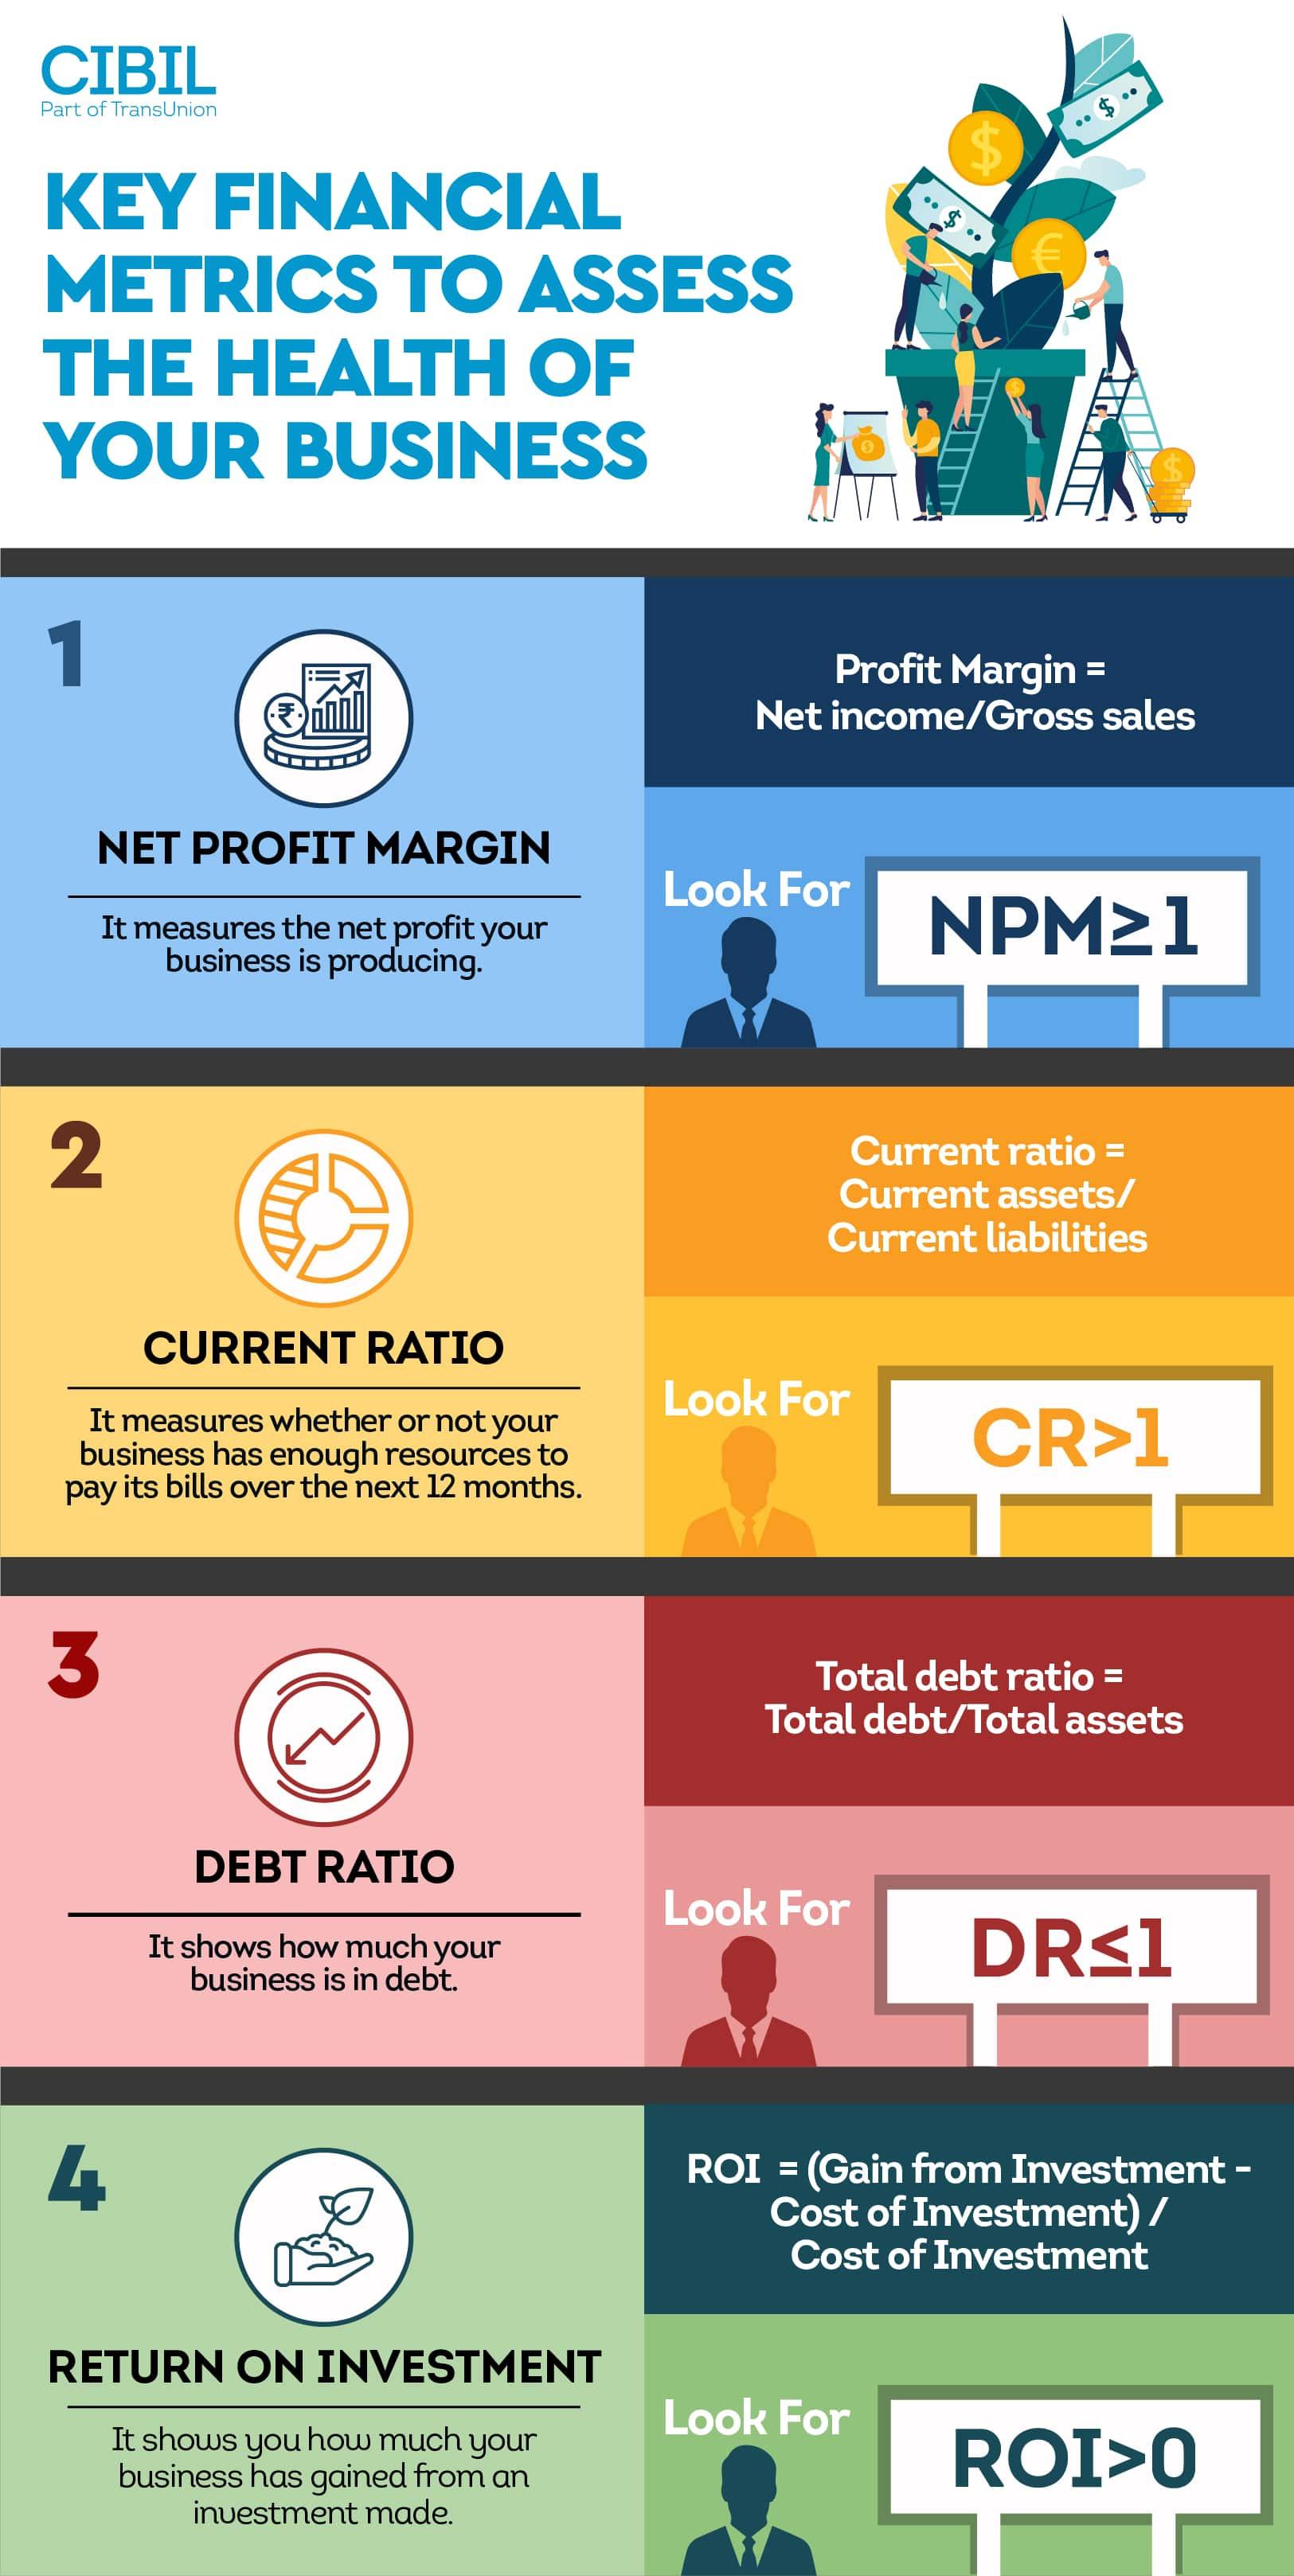 Key financial metrics